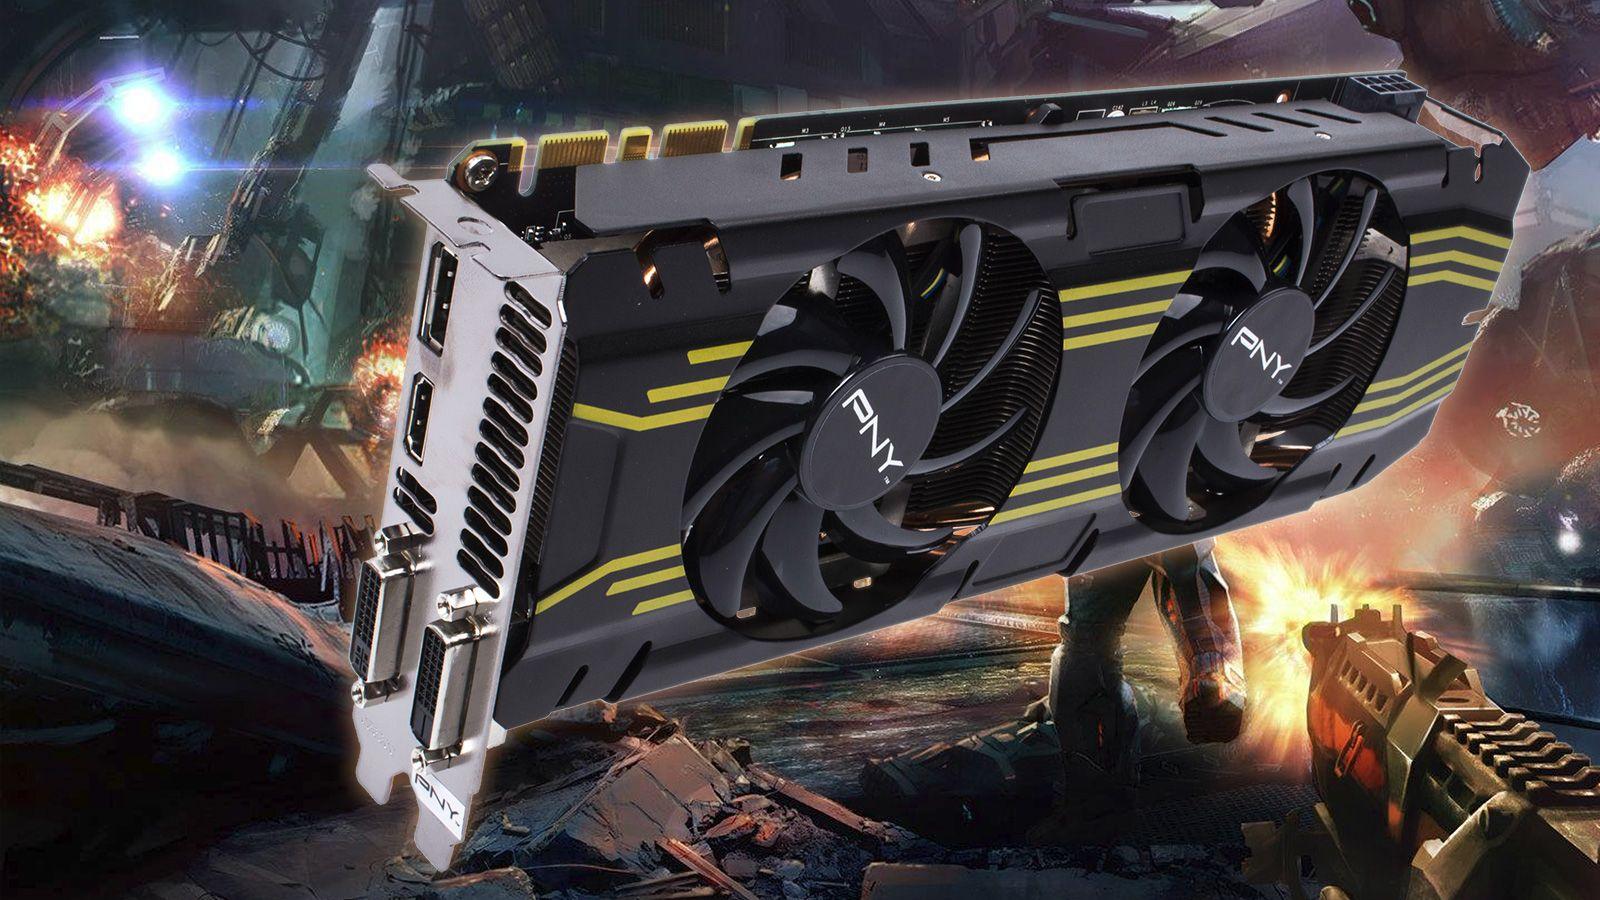 PNY XLR8 GeForce GTX 770 OC